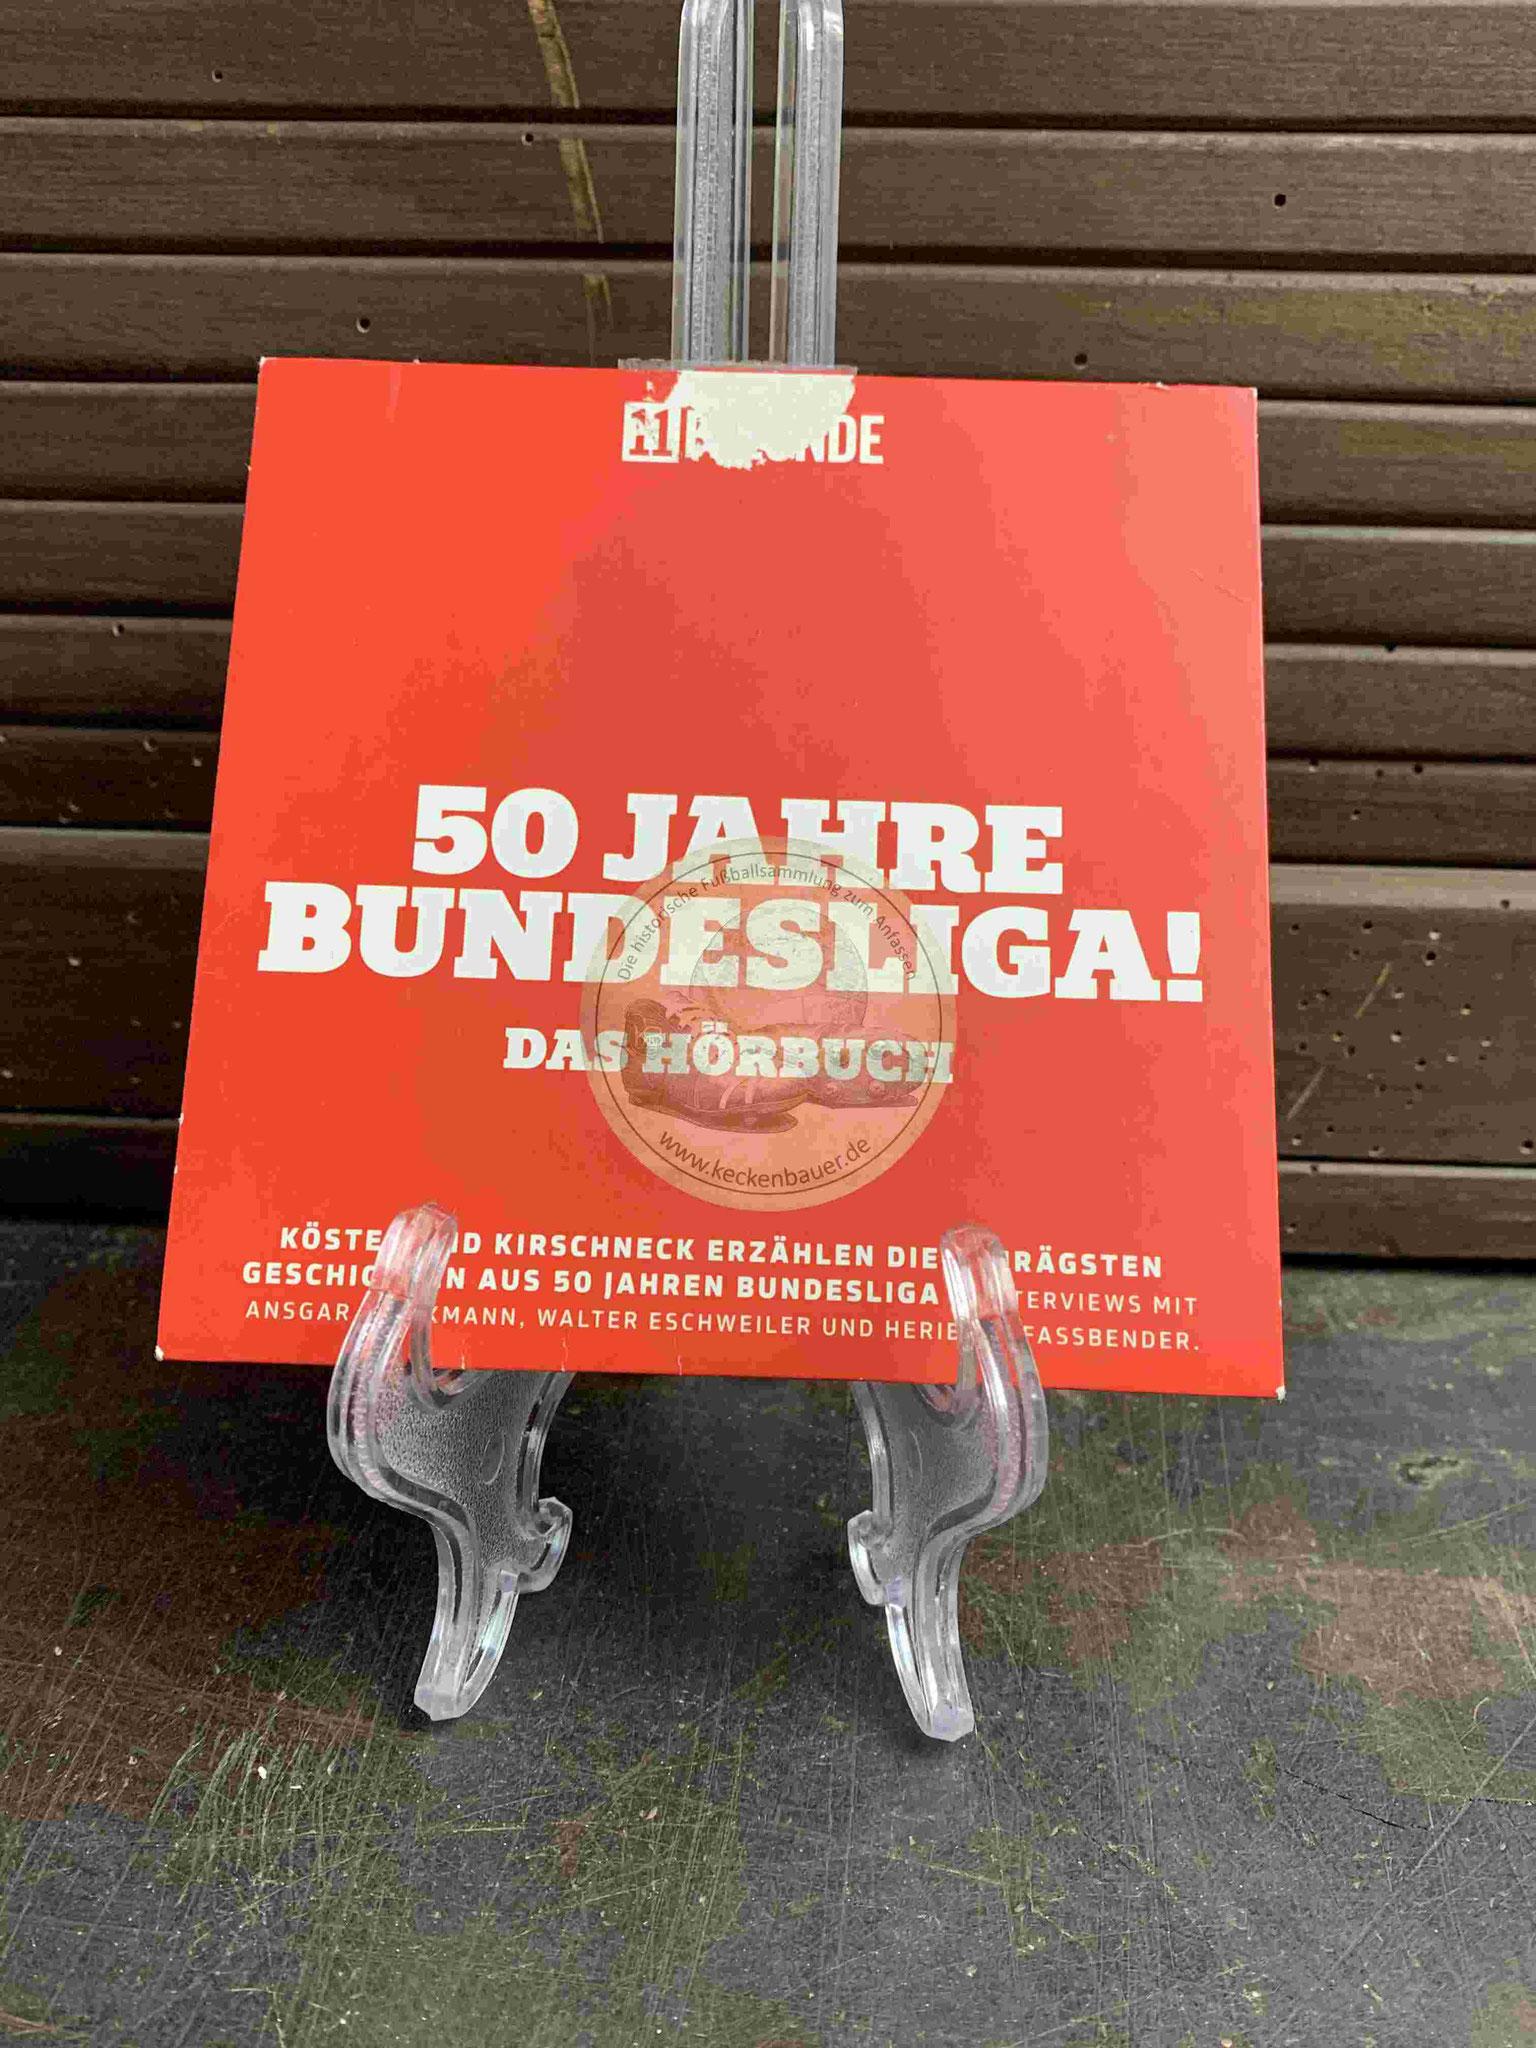 20130101 50 Jahre Bundesliga Das Hörbuch